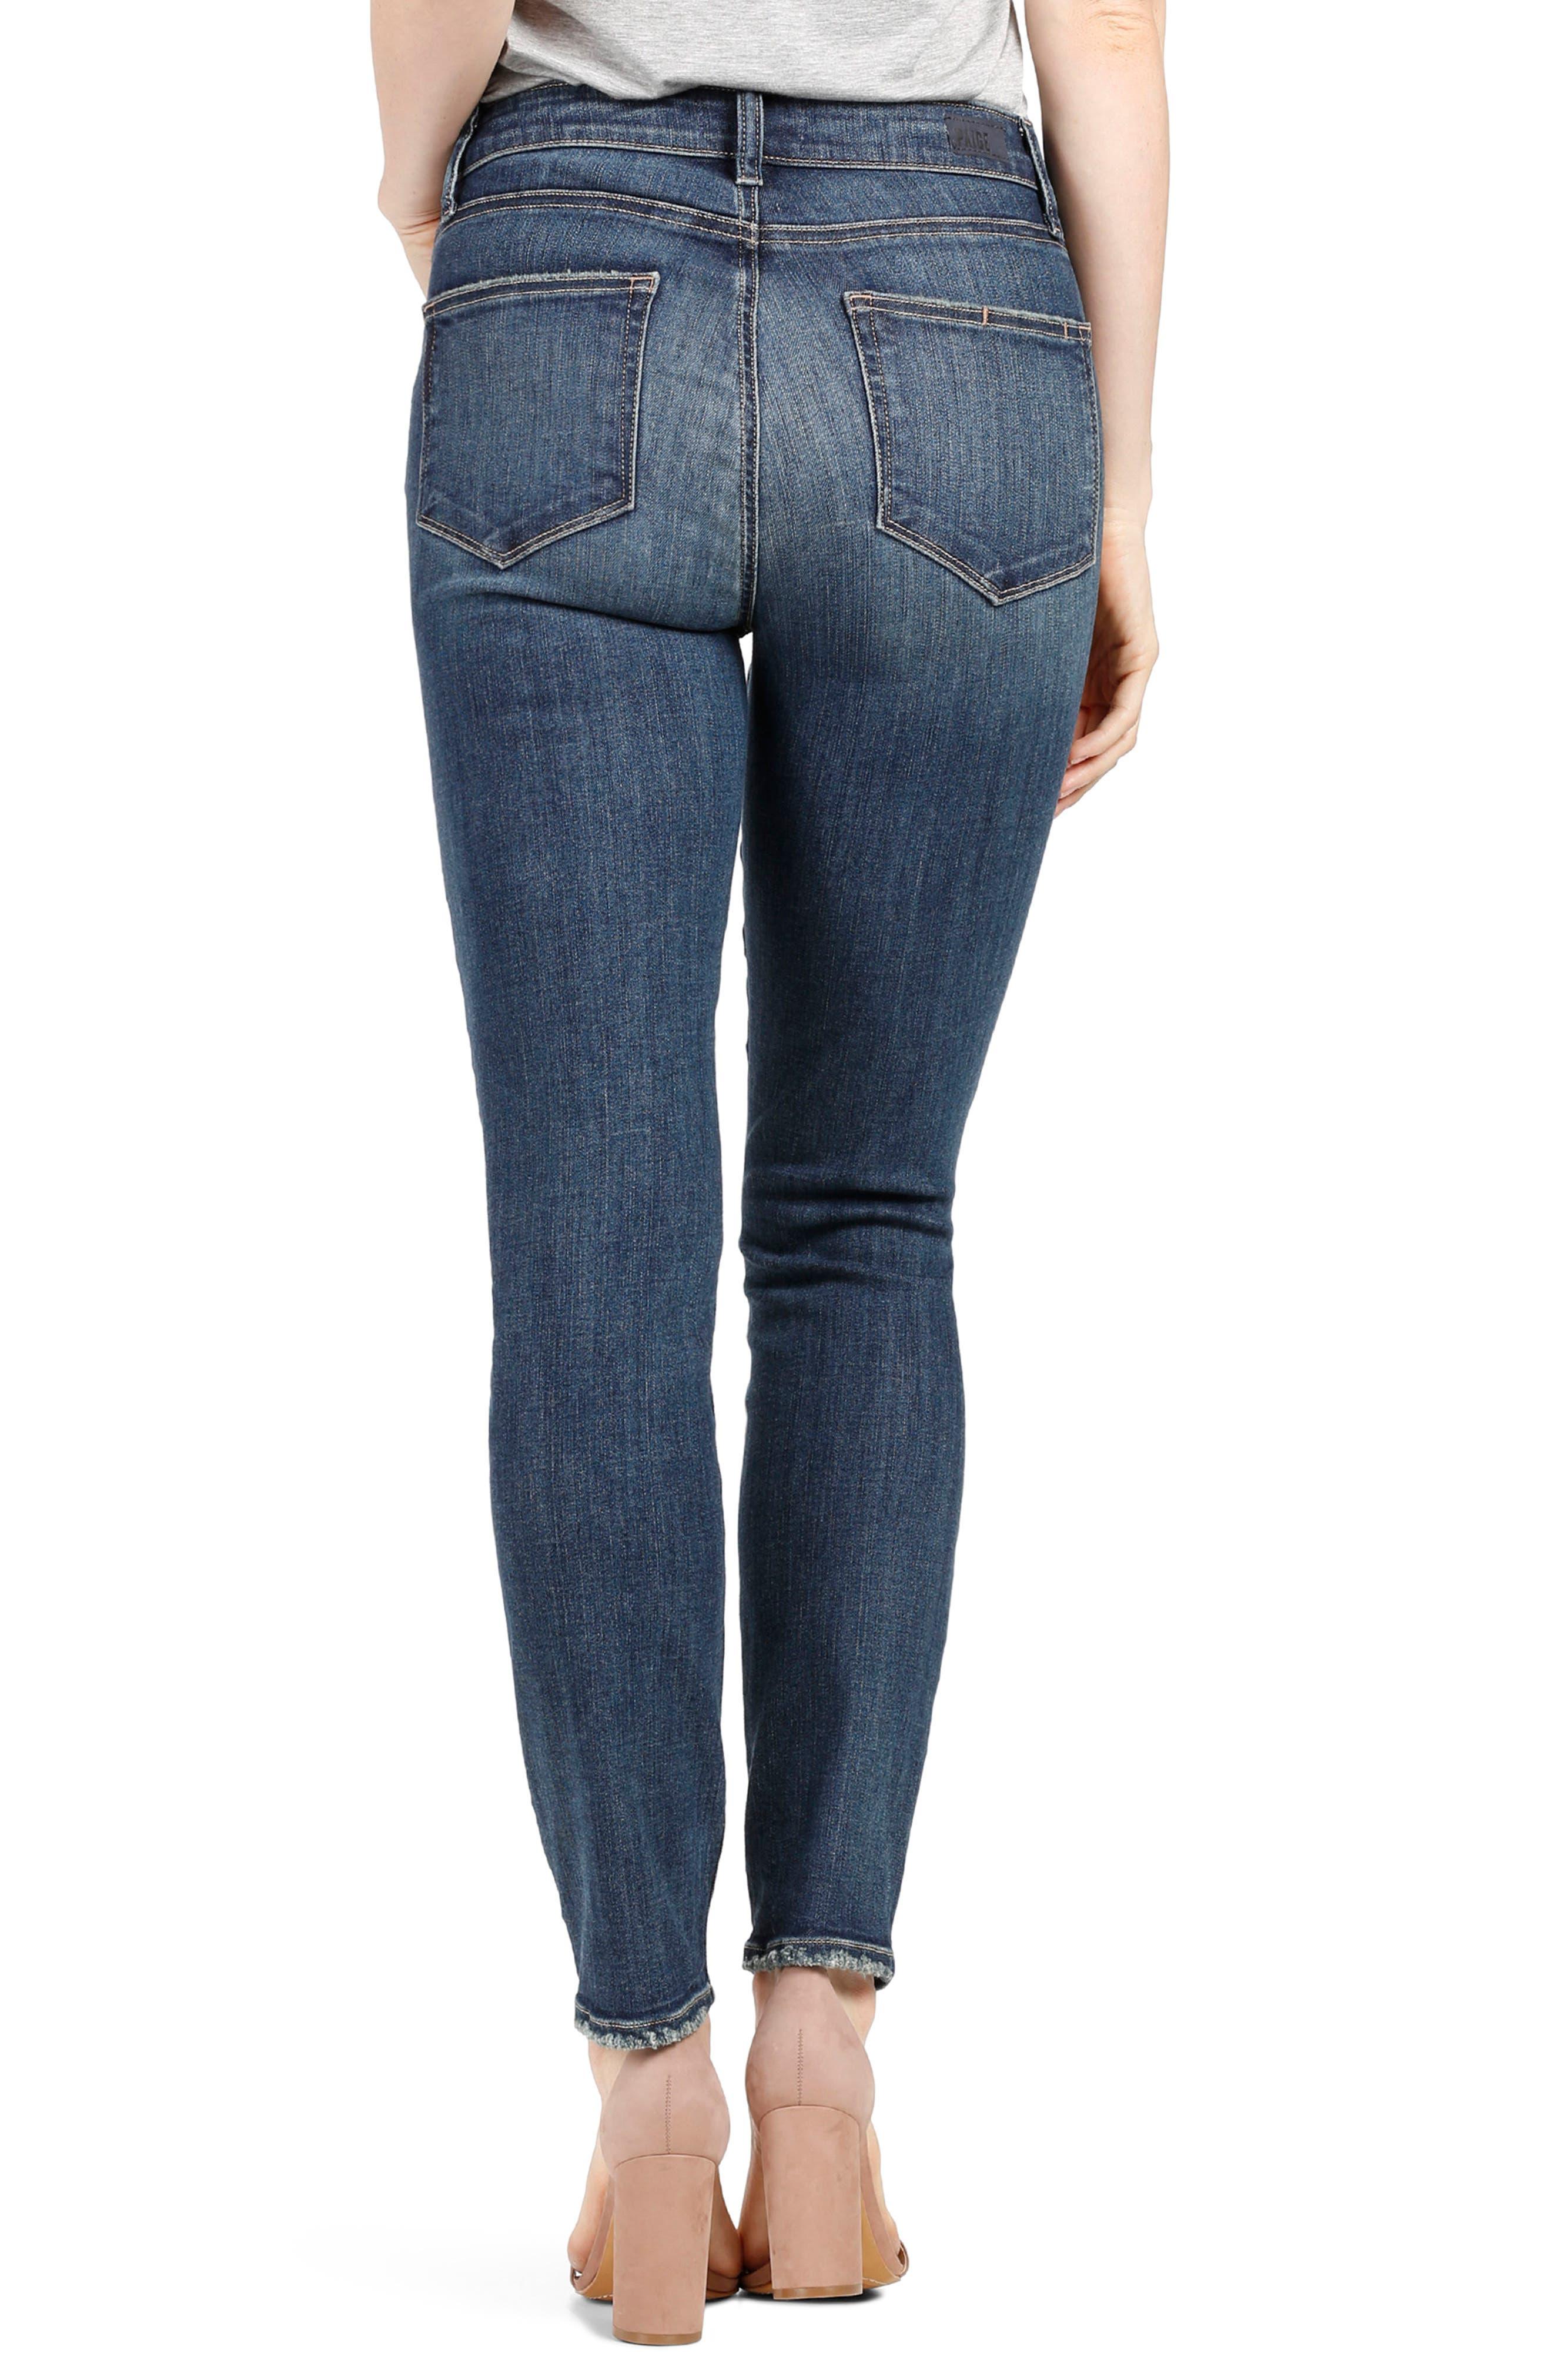 Transcend Vintage - Hoxton High Waist Ankle Skinny Jeans,                             Alternate thumbnail 2, color,                             400